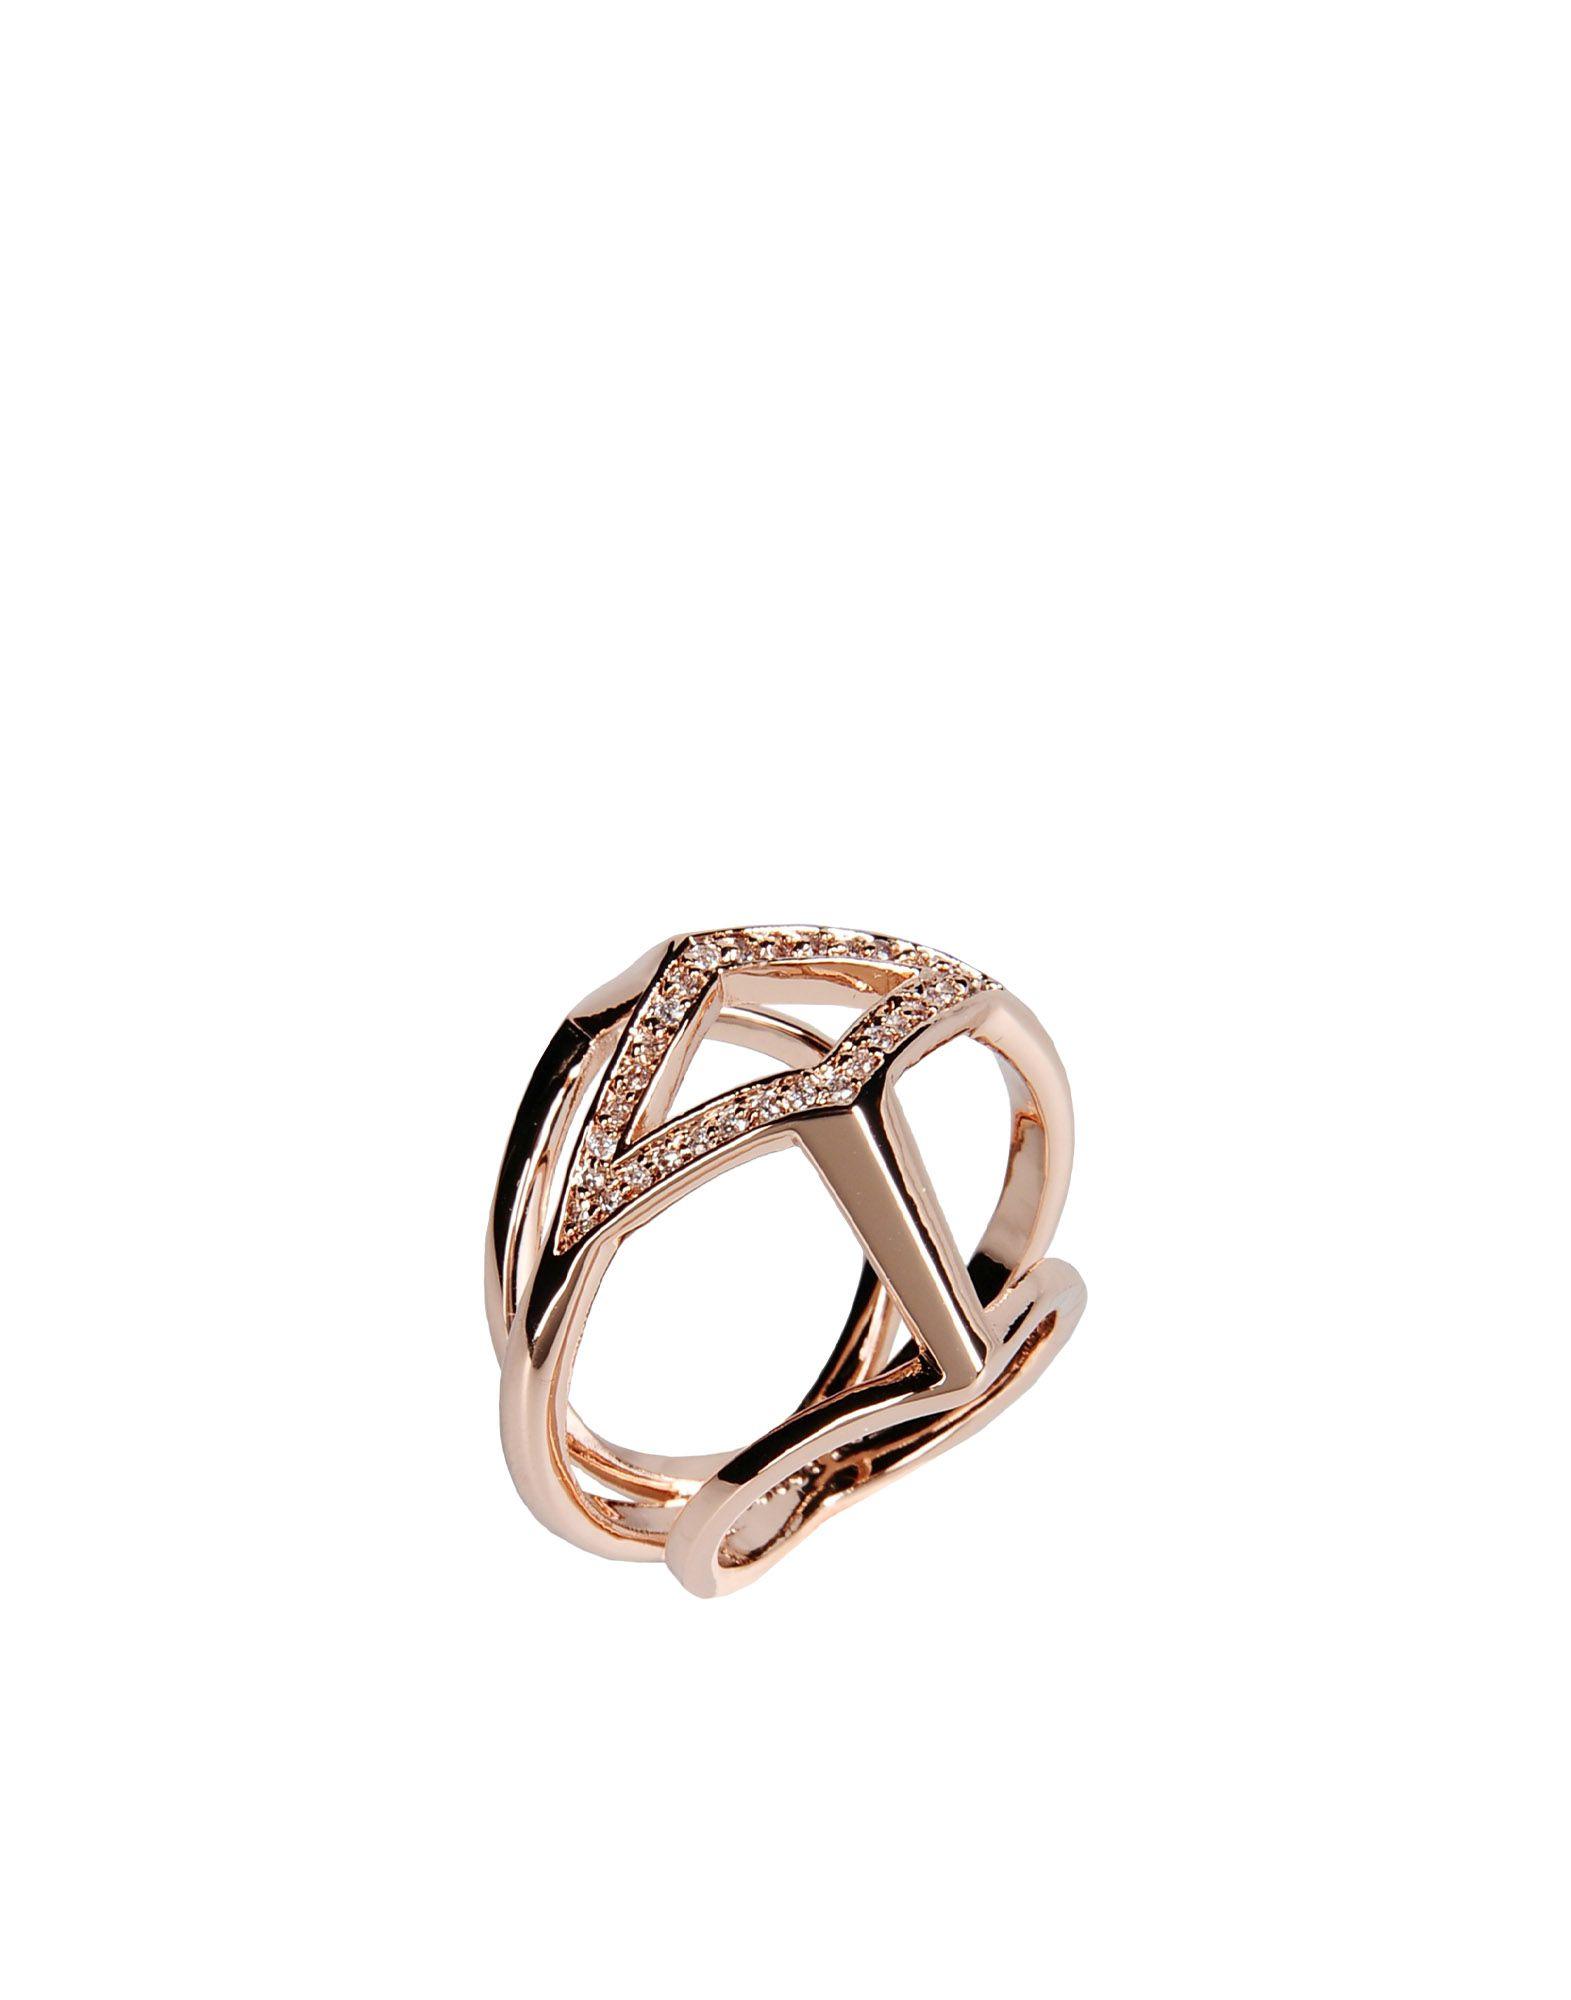 Eddie Borgo Rings